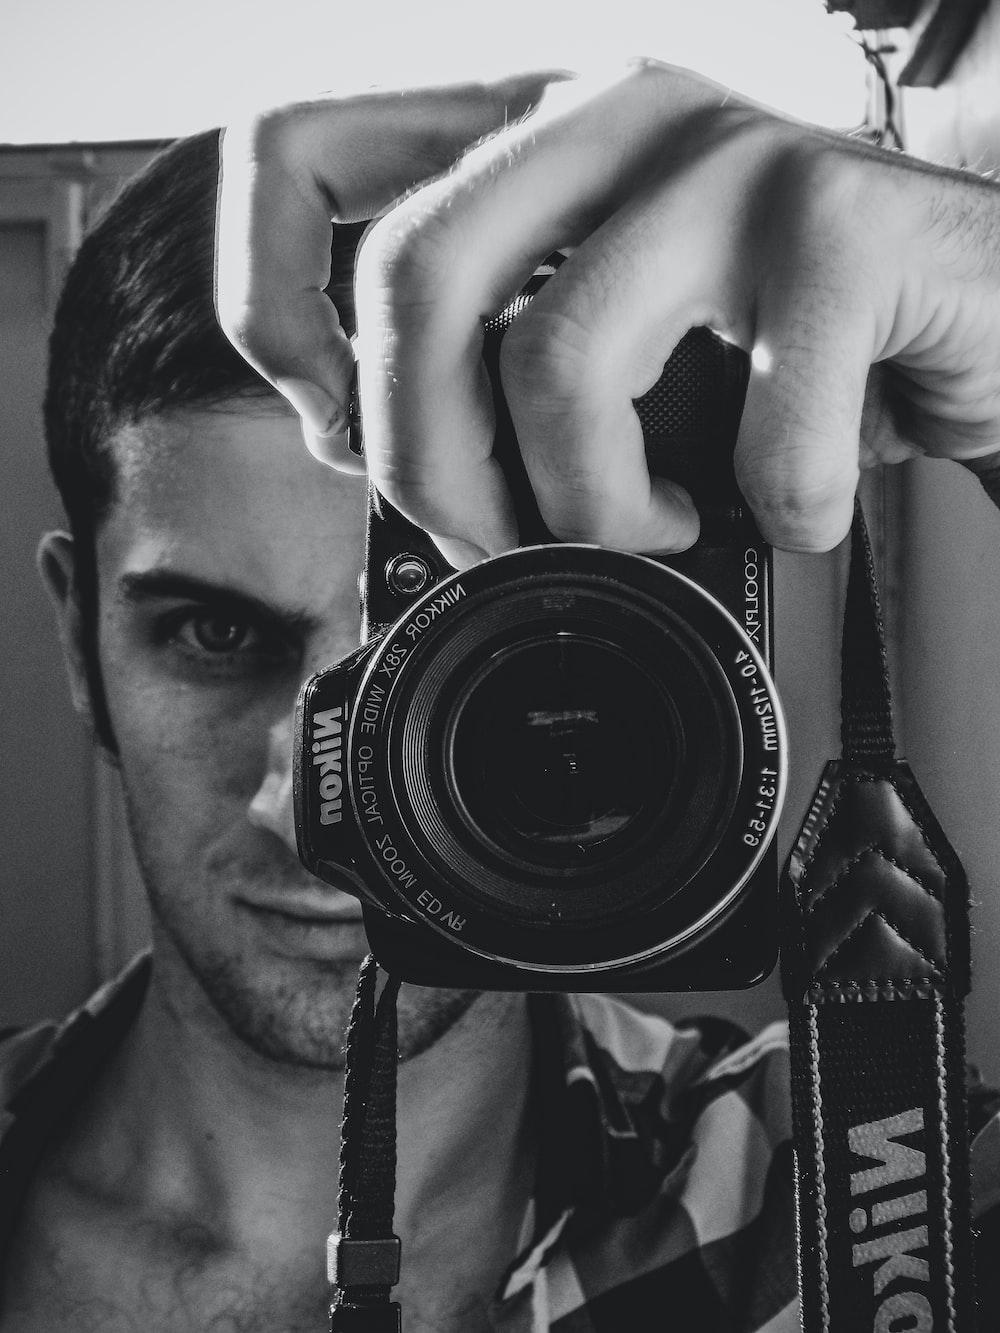 grayscale photo of man holding nikon dslr camera